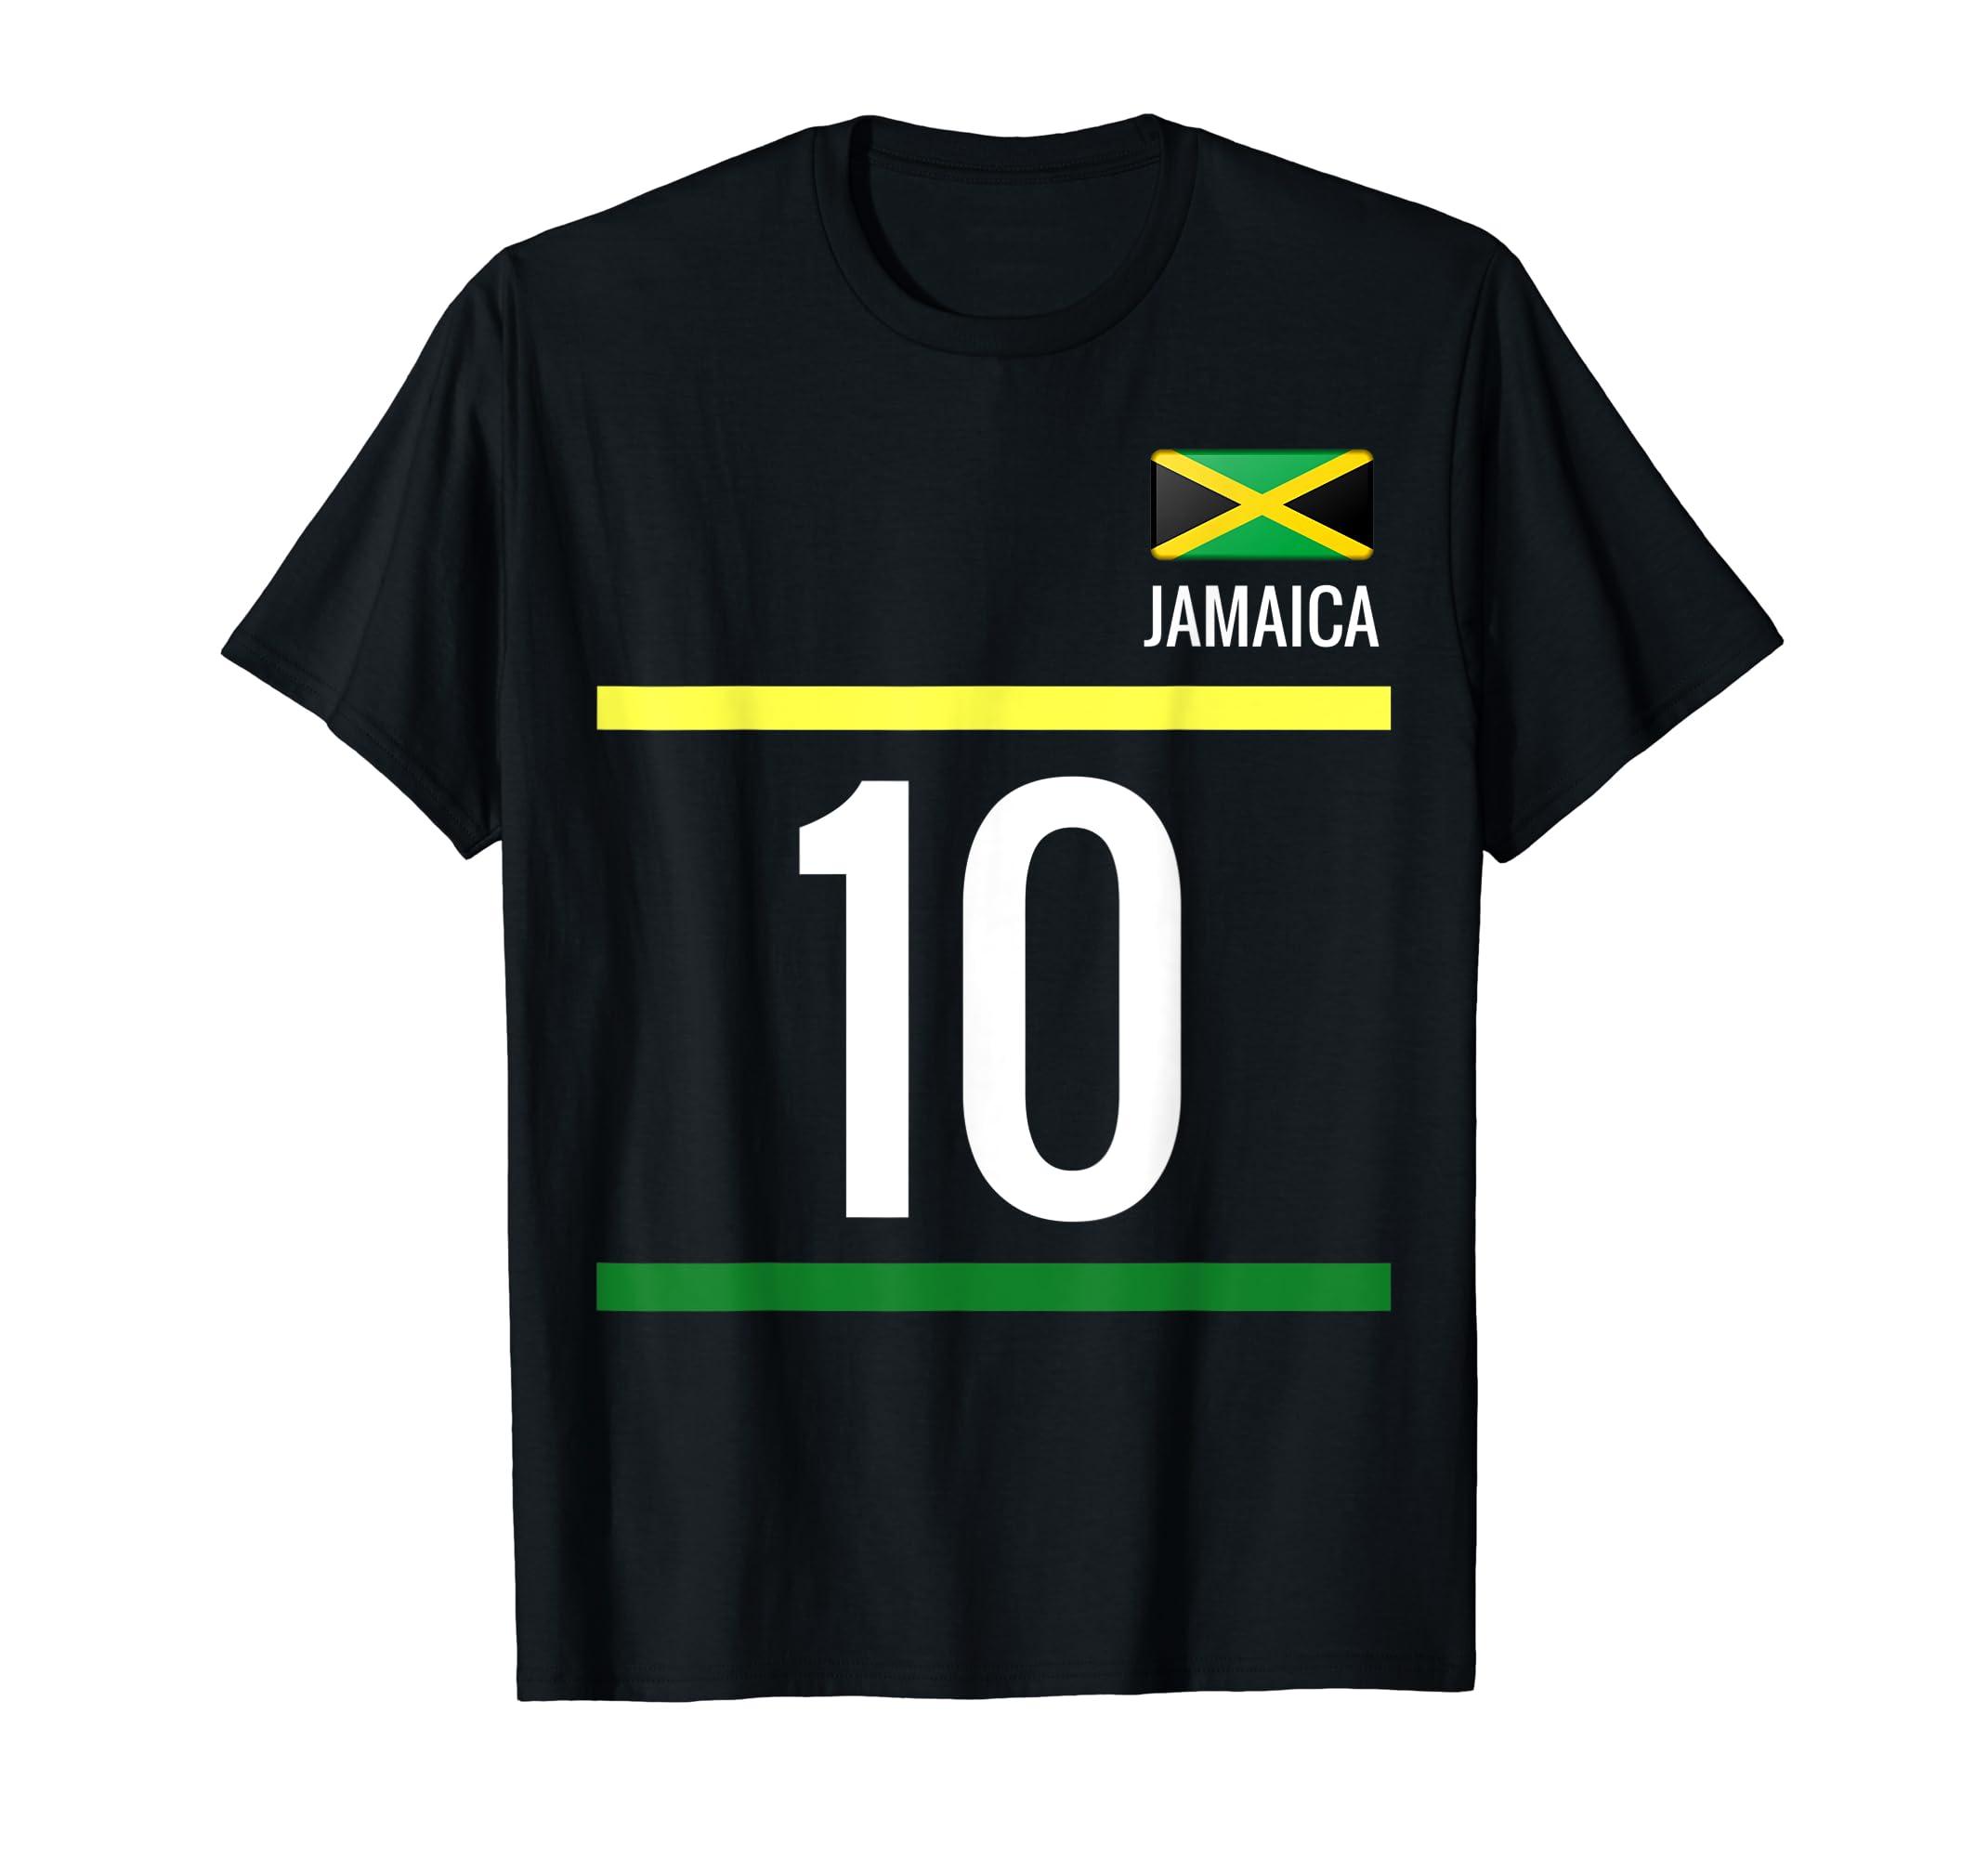 53c004fad Amazon.com  Jamaica Soccer T-Shirt - Jamaican Football Jersey 10  Clothing